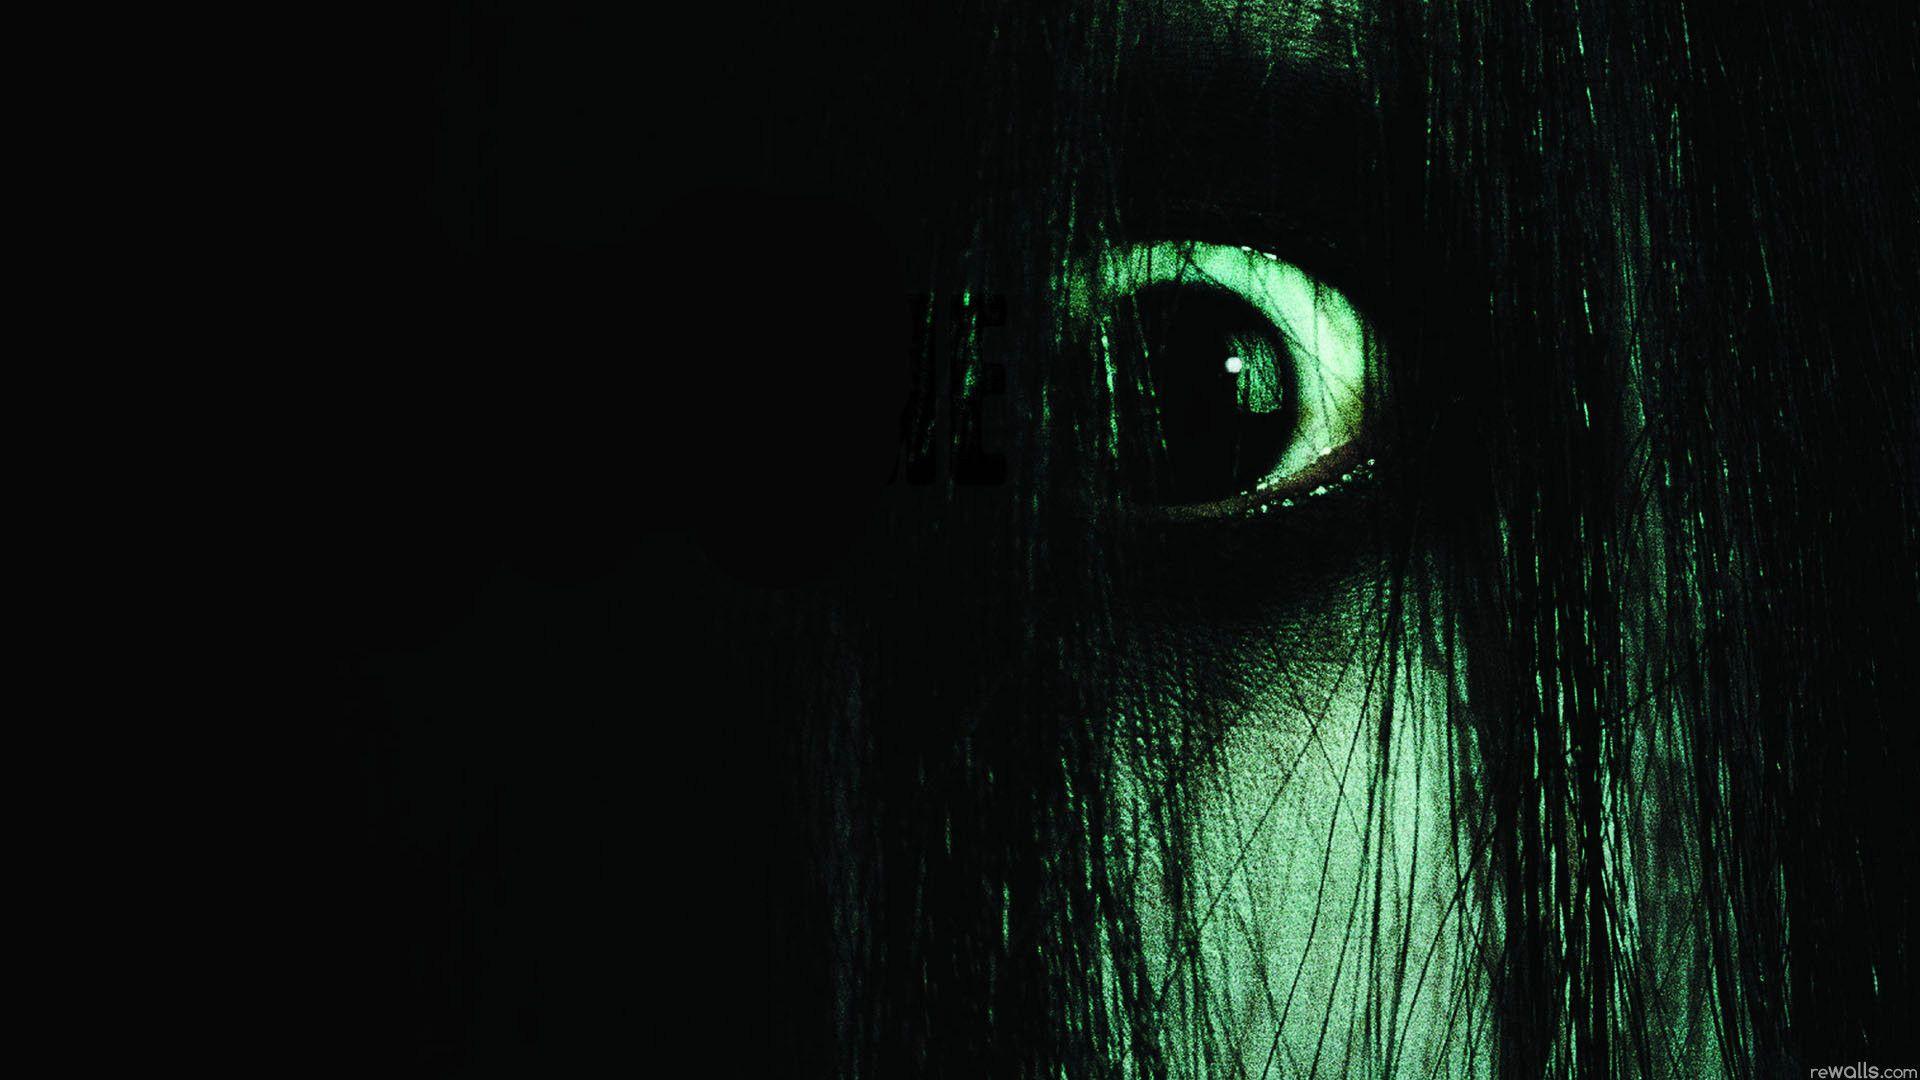 Horror Wallpapers Hd Free Download: Creepy Wallpaper HD